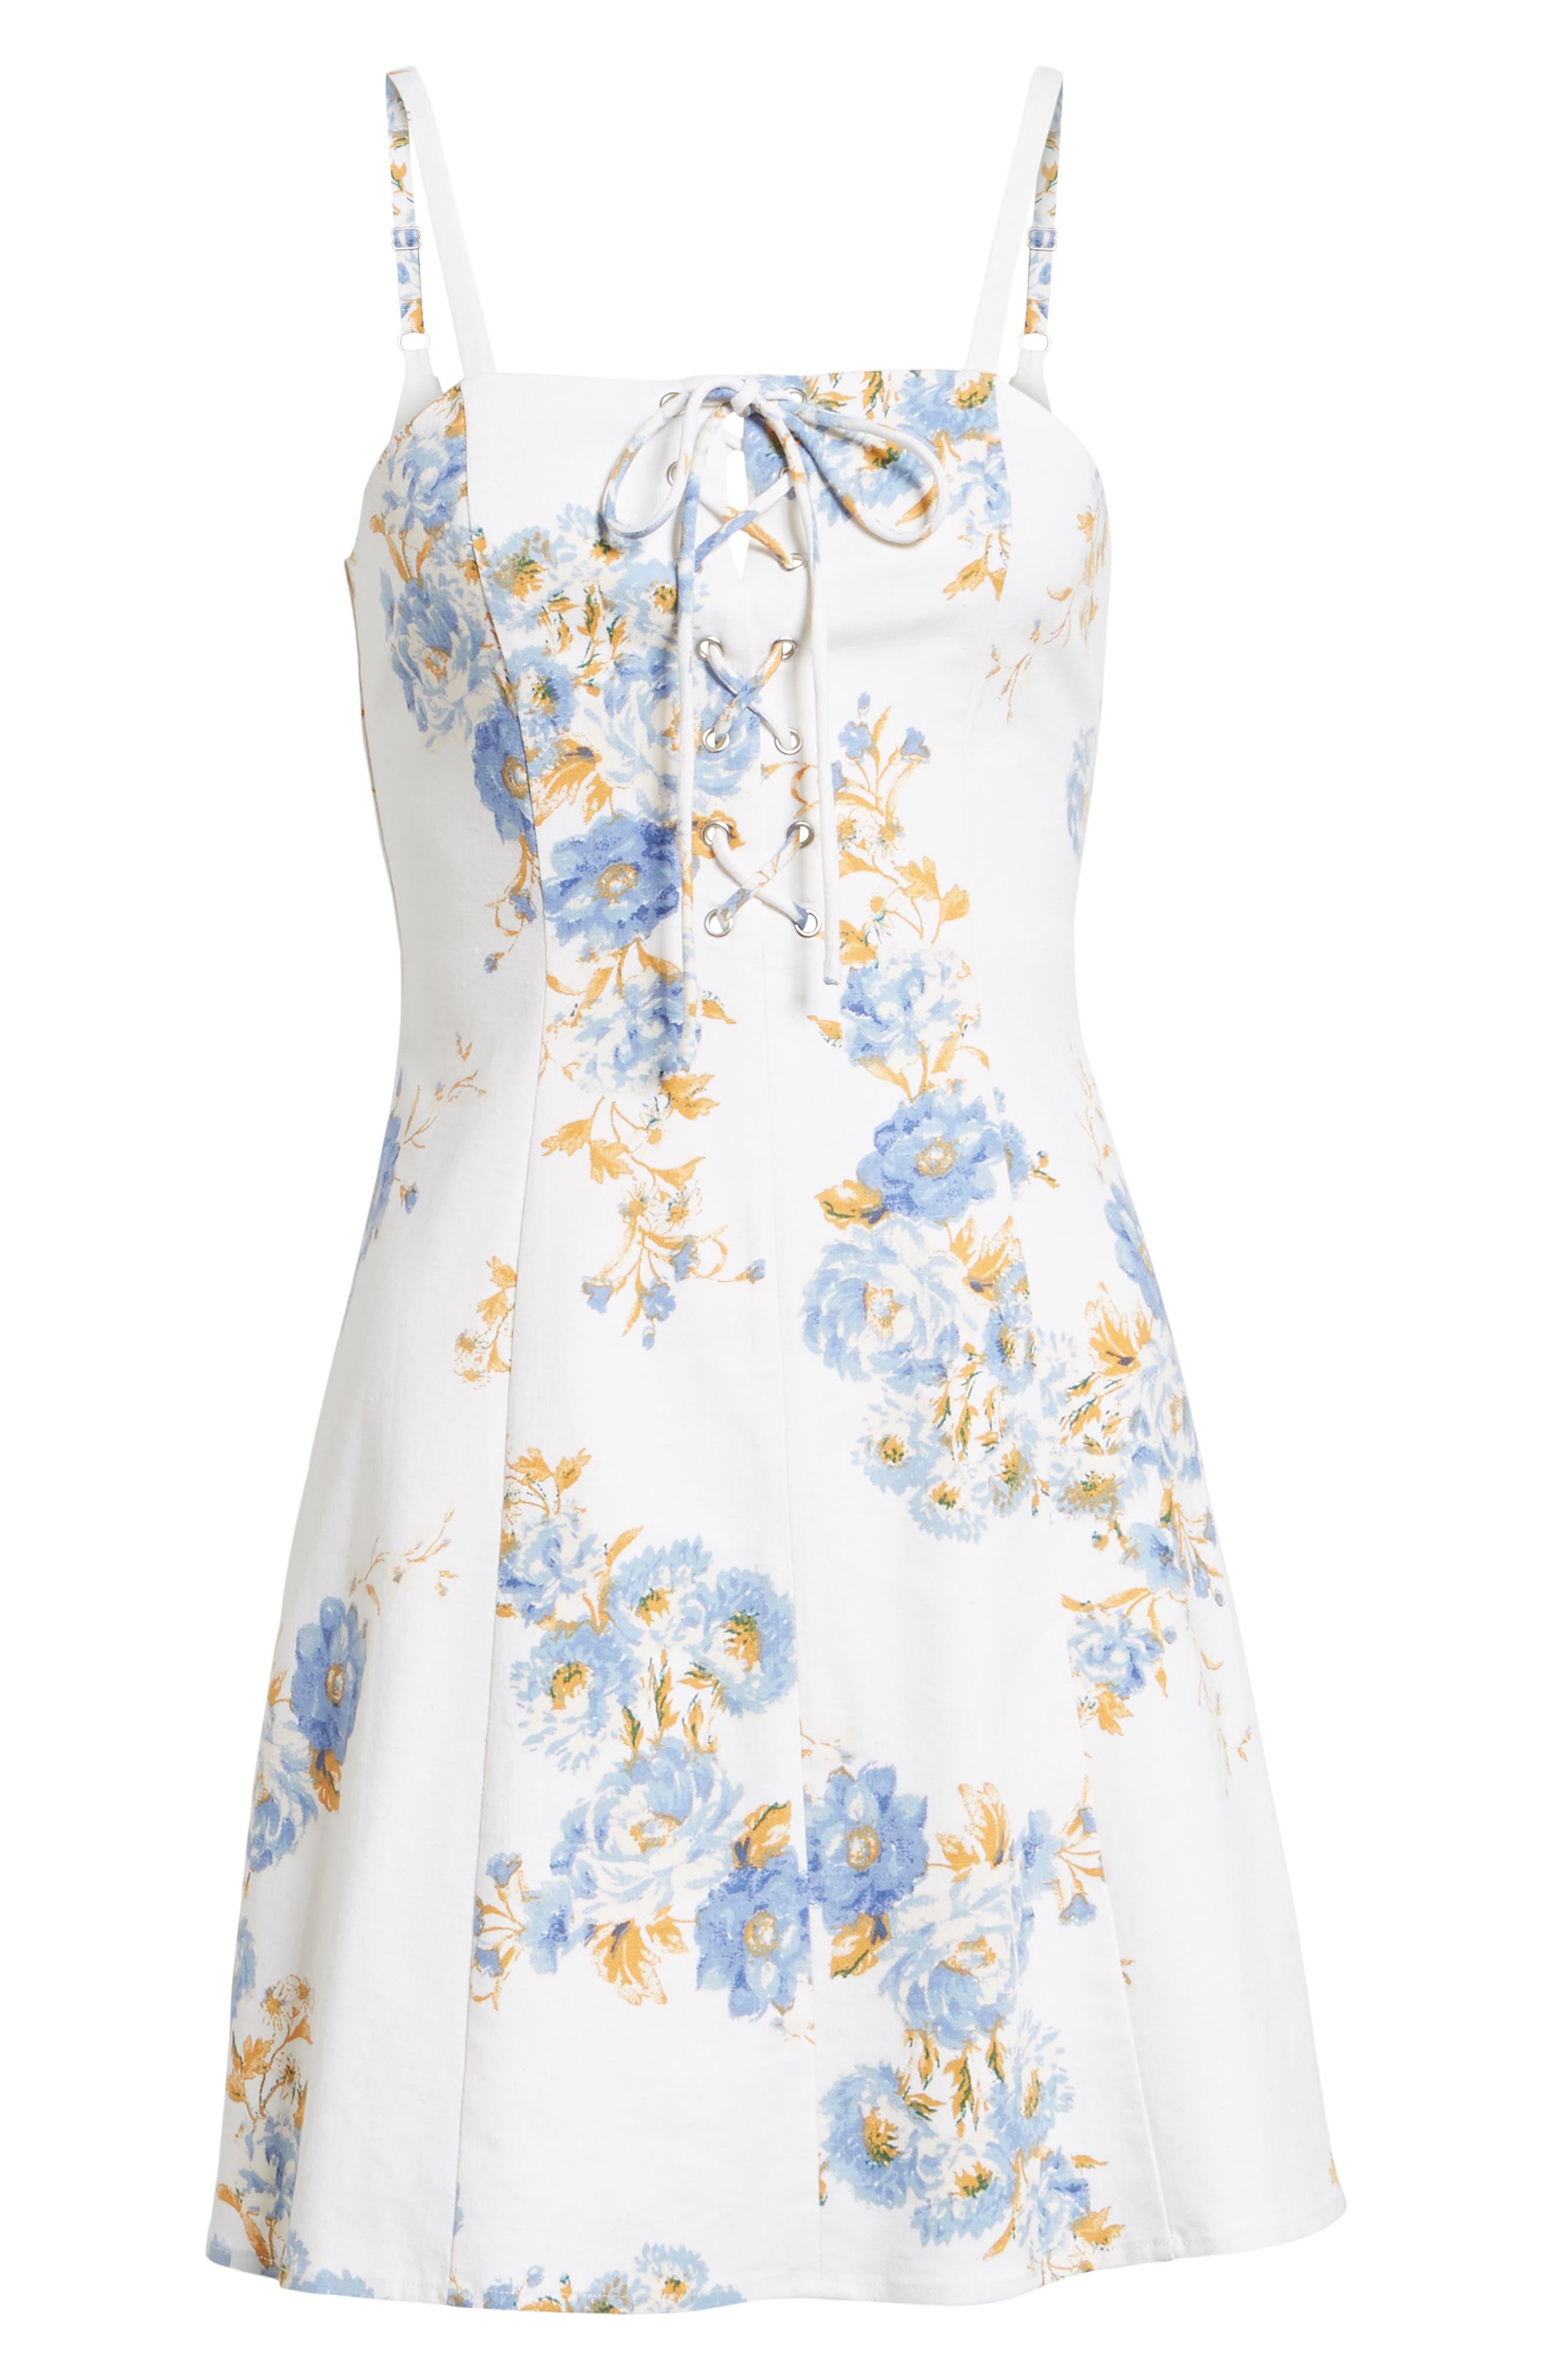 Modena Lace-Up Minidress,                             Alternate thumbnail 6, color,                             Ivory Floral